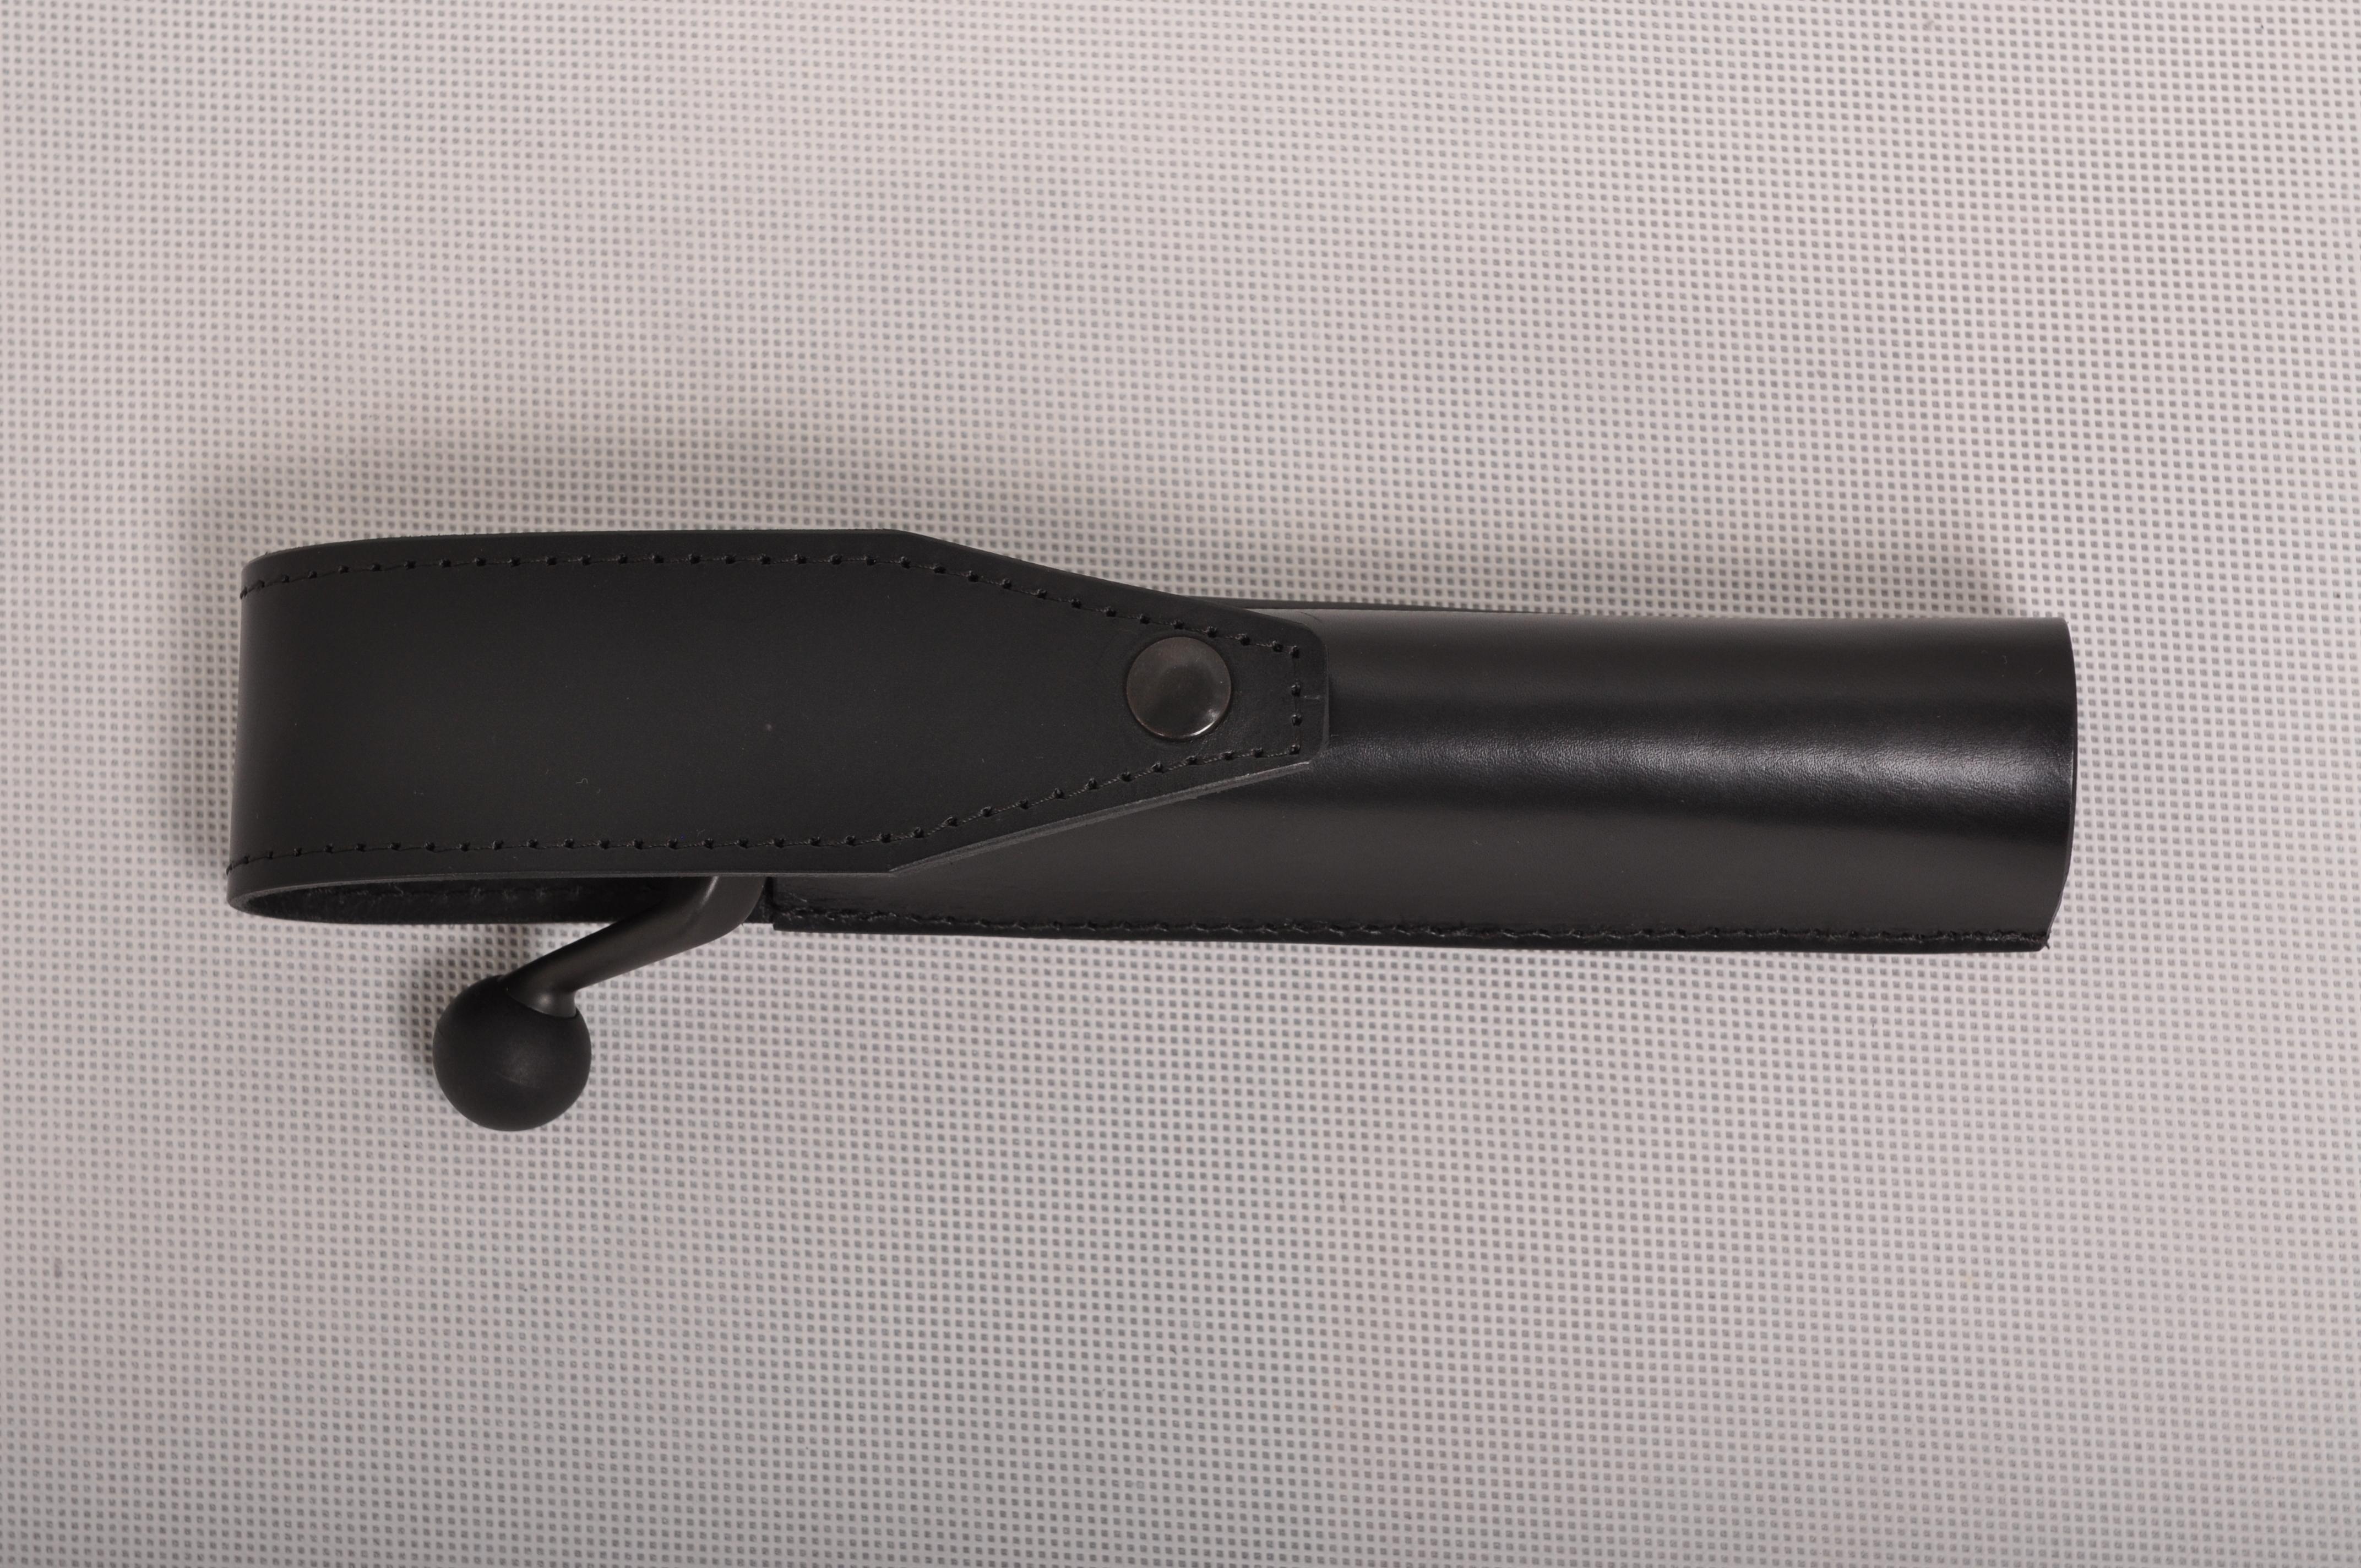 Model 531